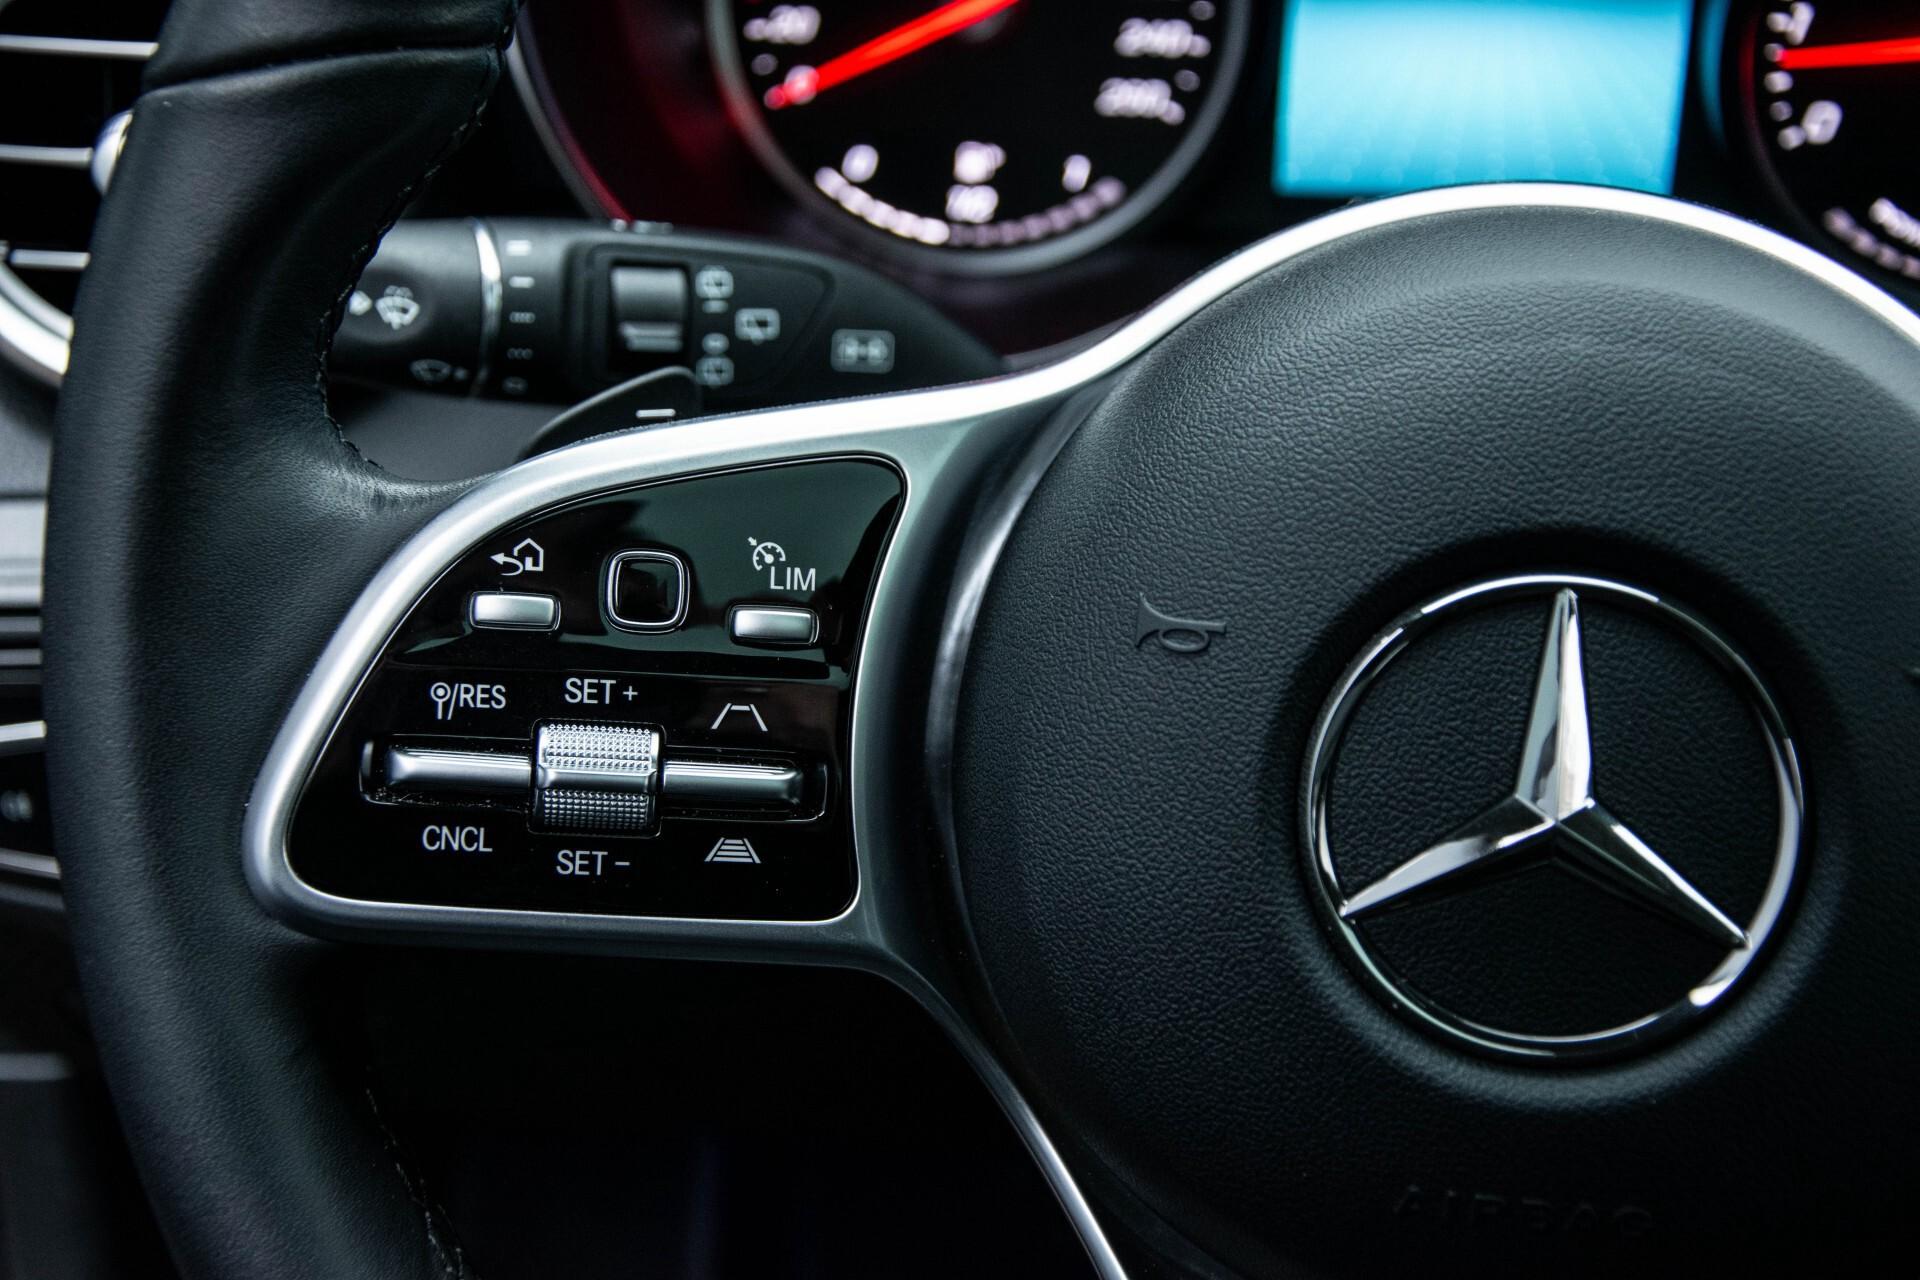 Mercedes-Benz GLC 200 4-M AMG Night/Panorama/Distronic Pro/Burmester/360camera/Exclusive Aut9 Foto 9